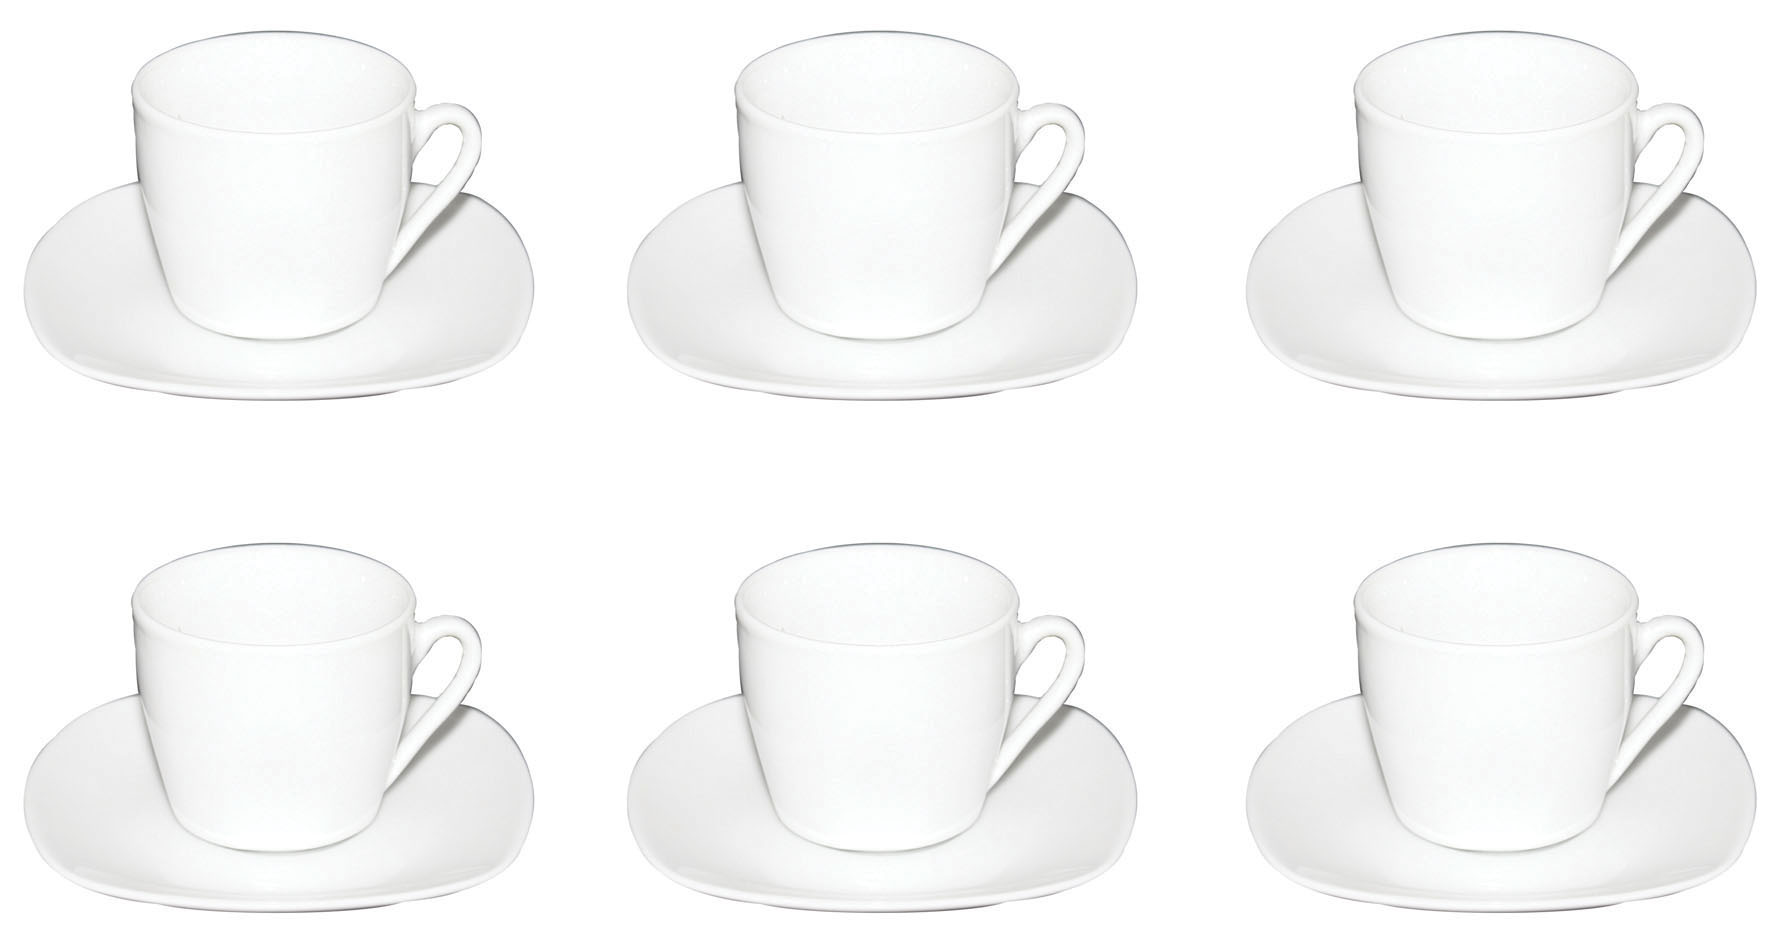 SERV CAFFE  PZ 6 C P KENT